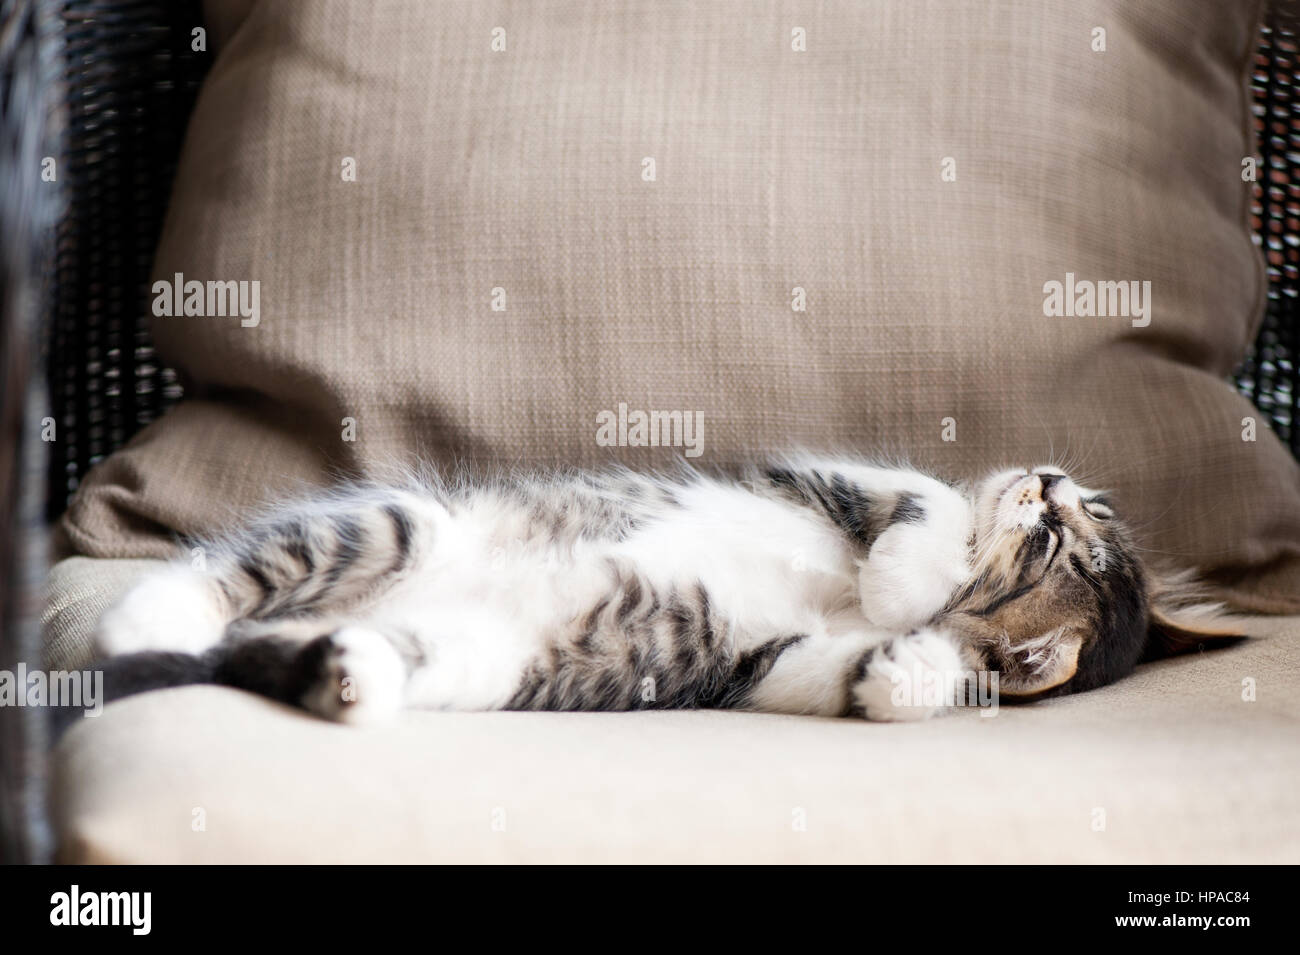 Tabby kitten lying on back,sleeping - Stock Image